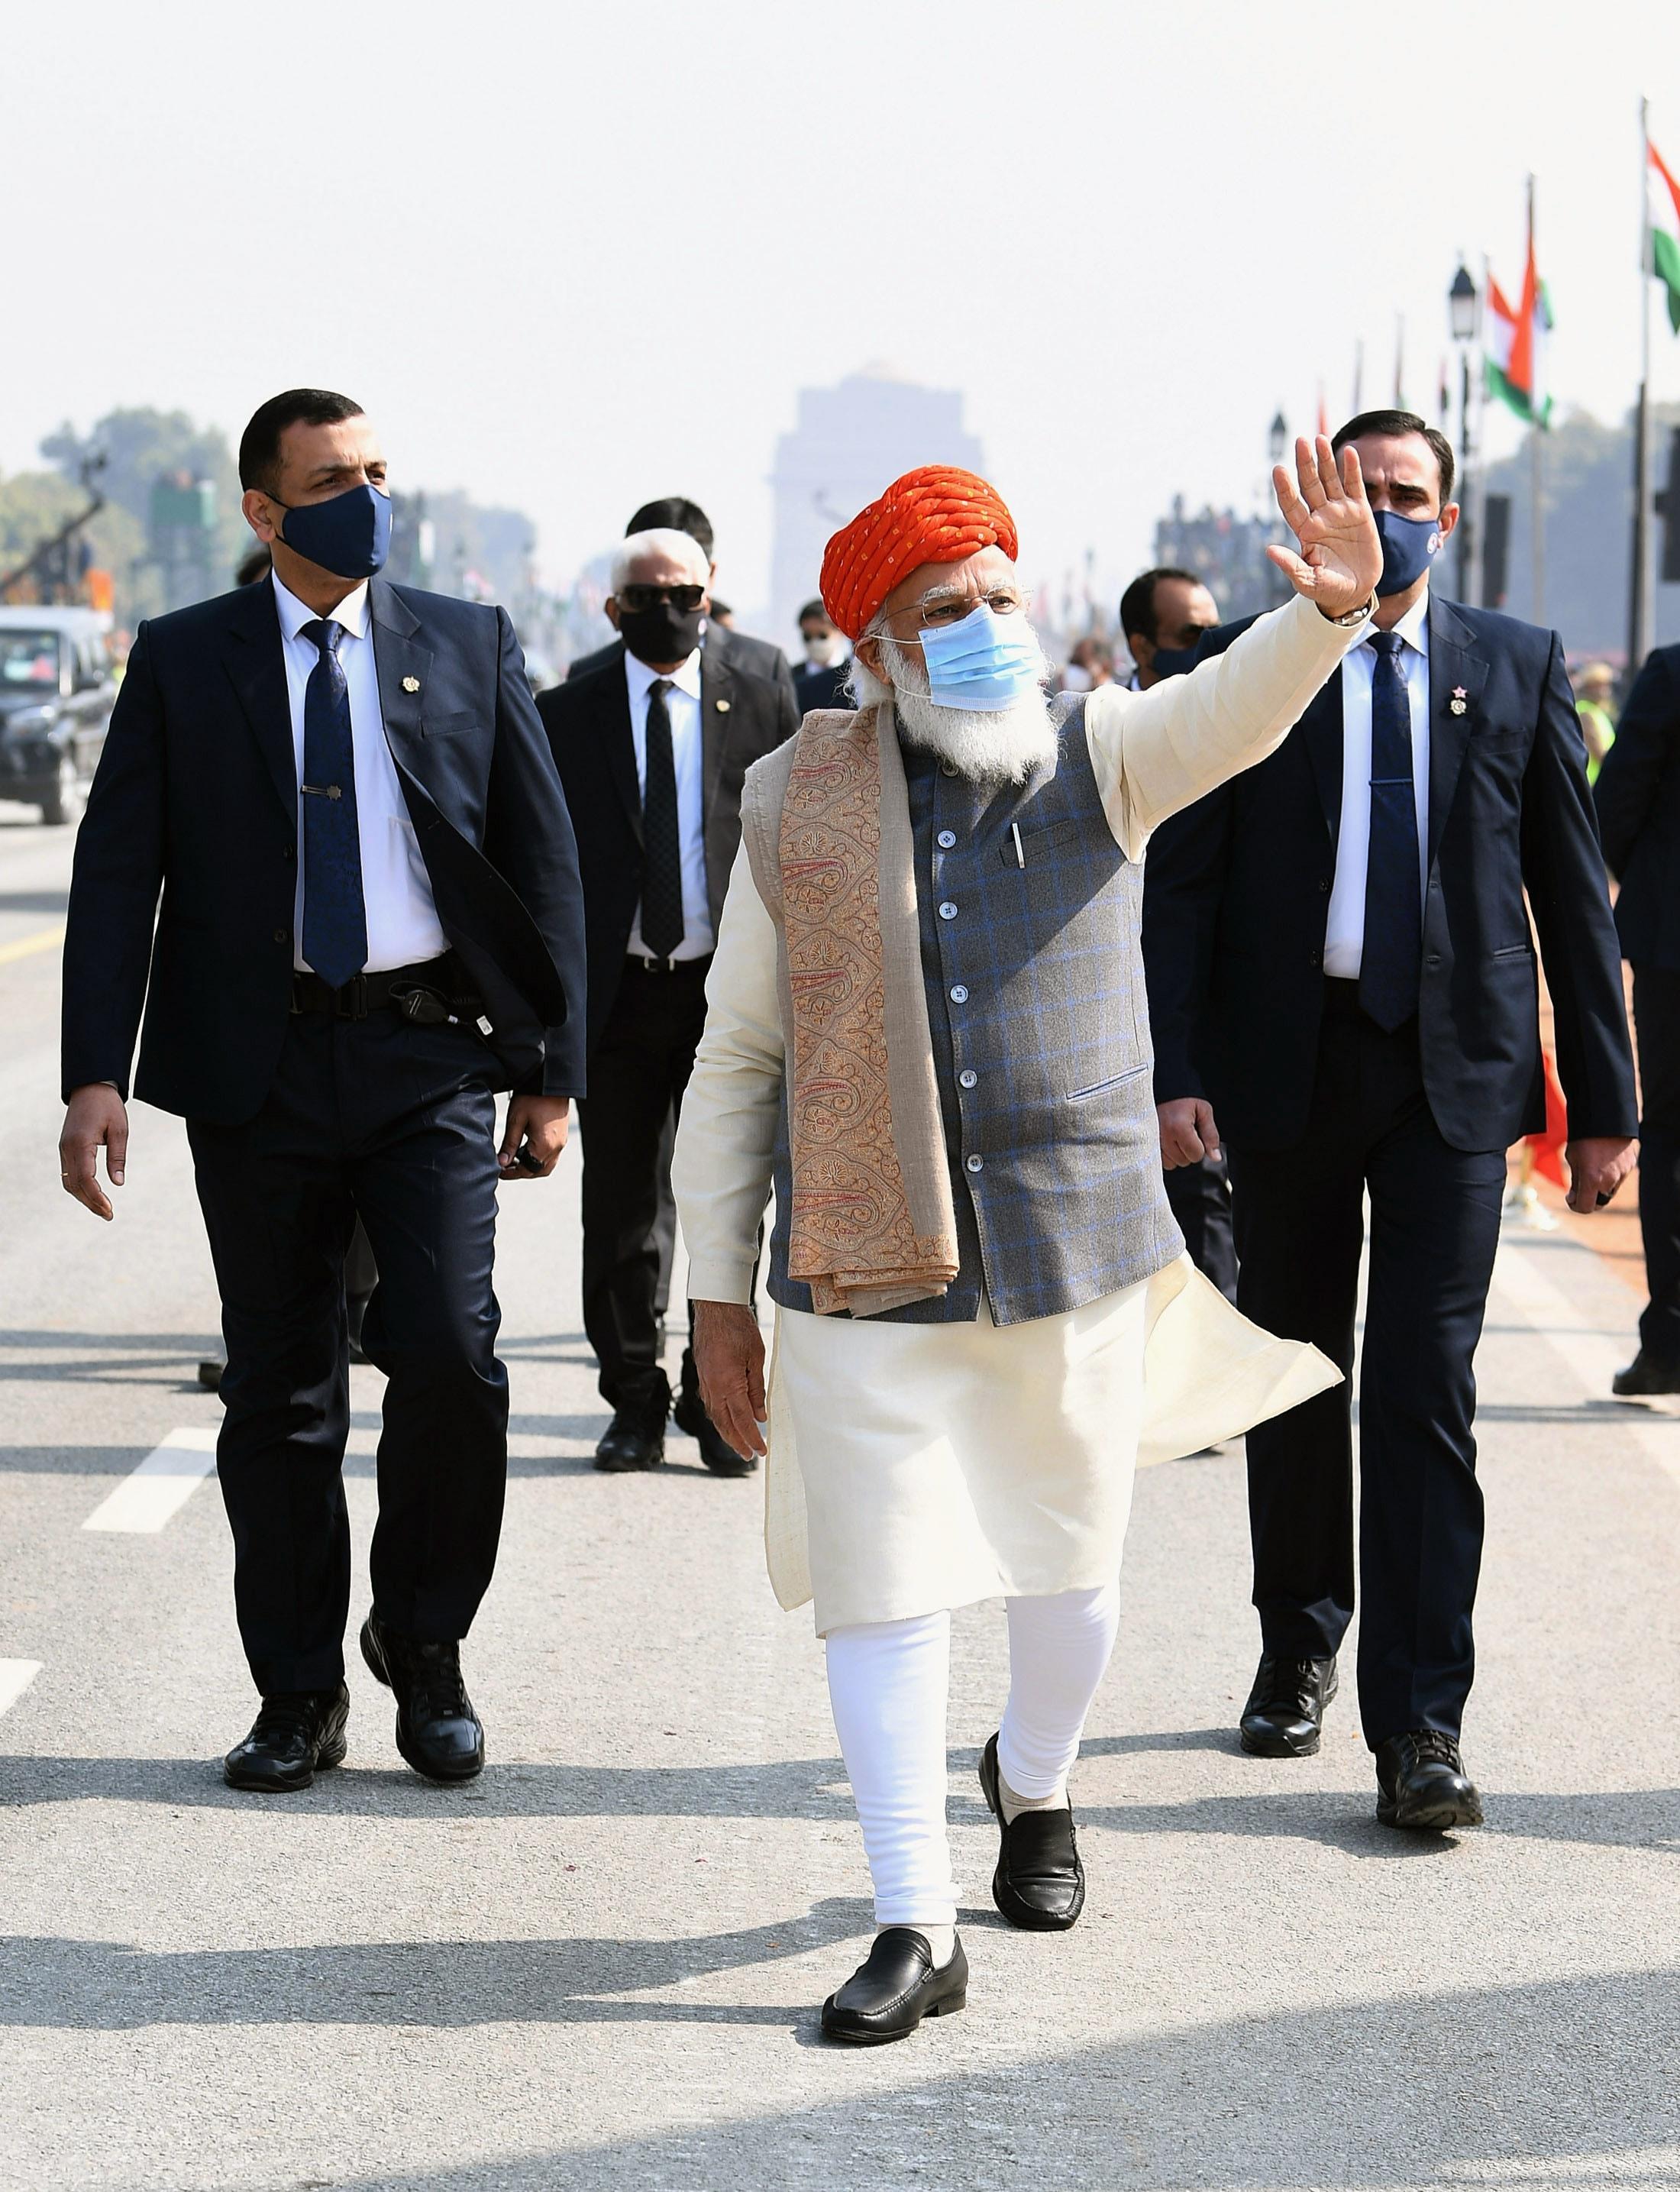 Prime Minister Narendra Modi at Rajpath during the 72nd Republic Day Celebrations in New Delhi